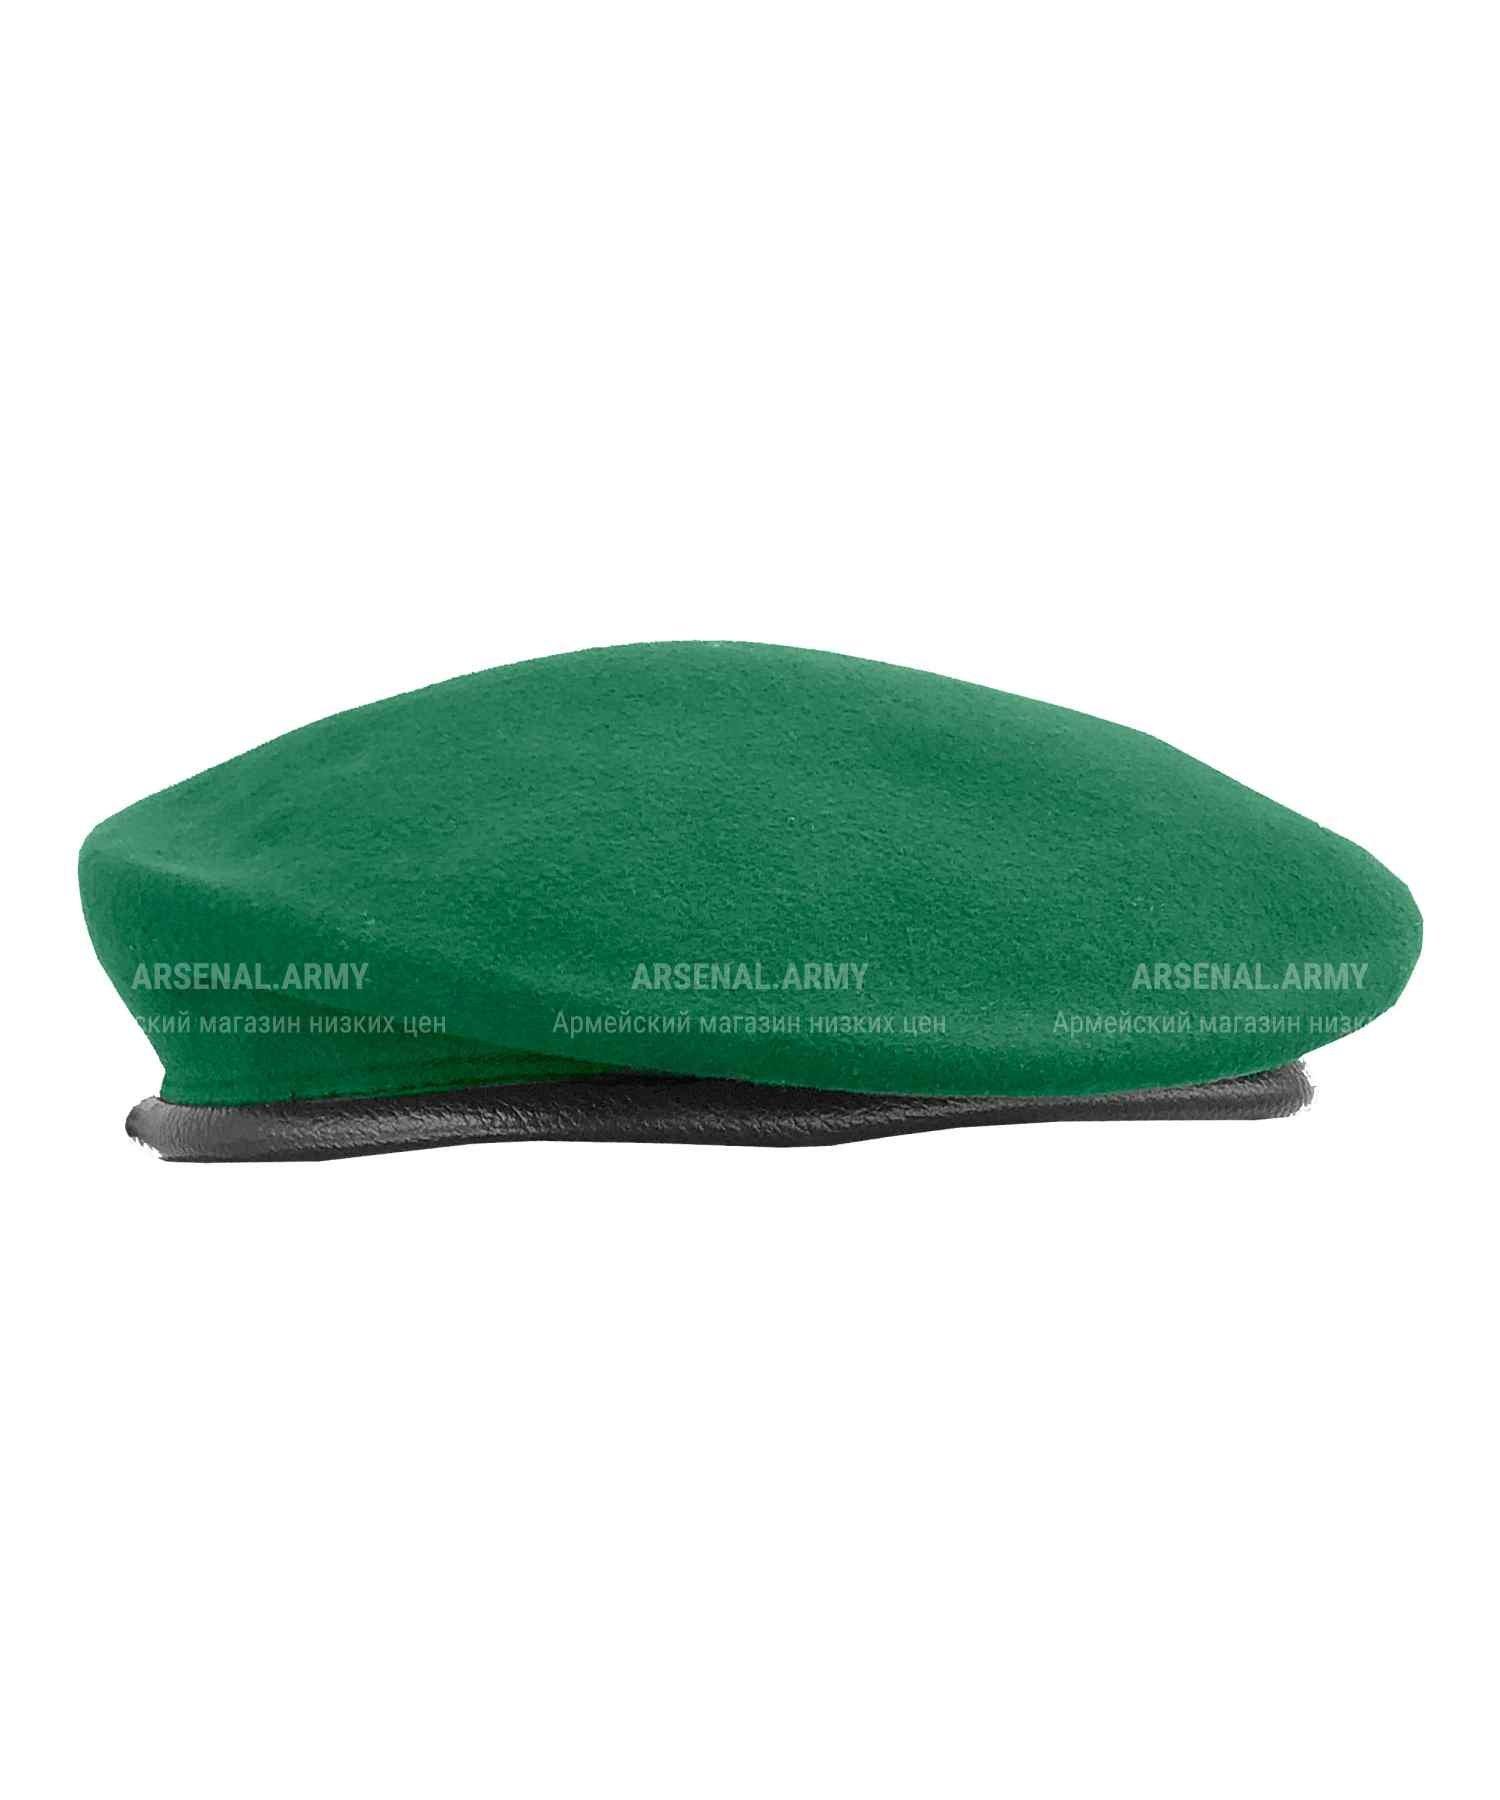 Берет зеленый катаный